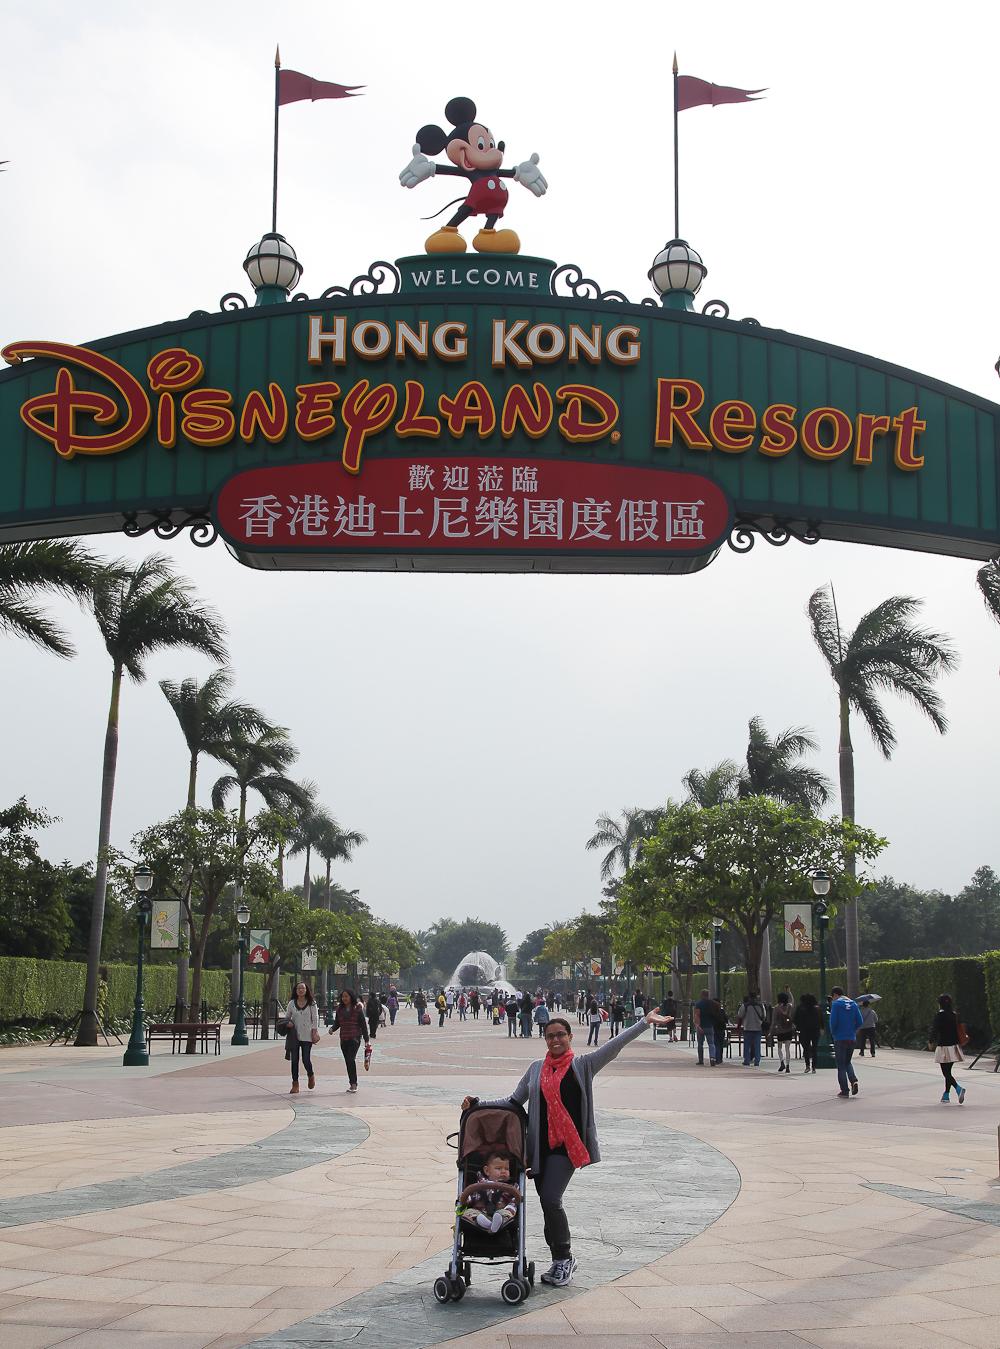 Hello from Disneyland!